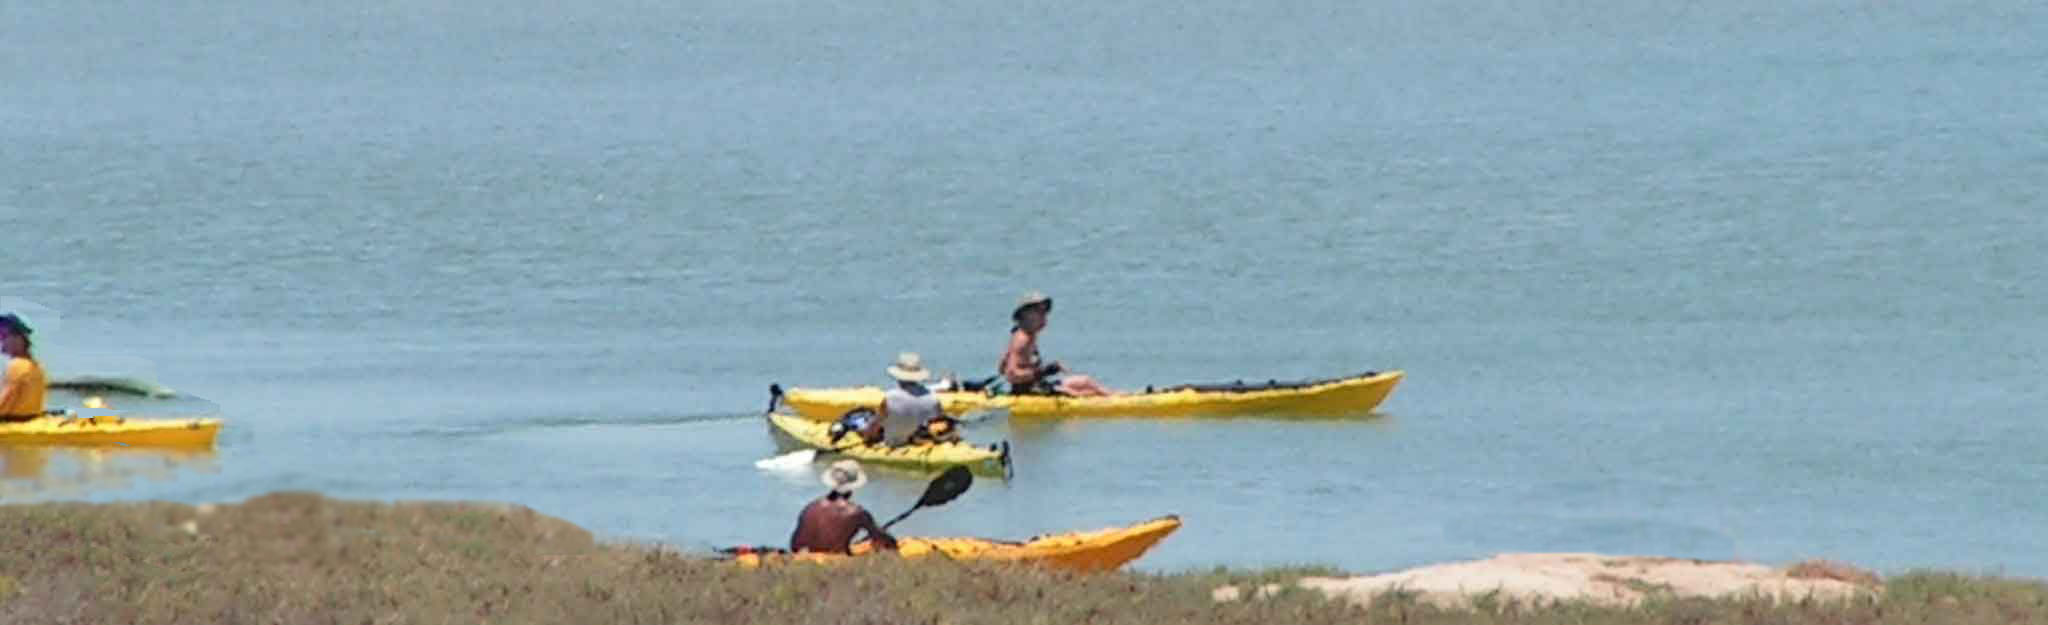 Puerto Penasco Mexico Kayak